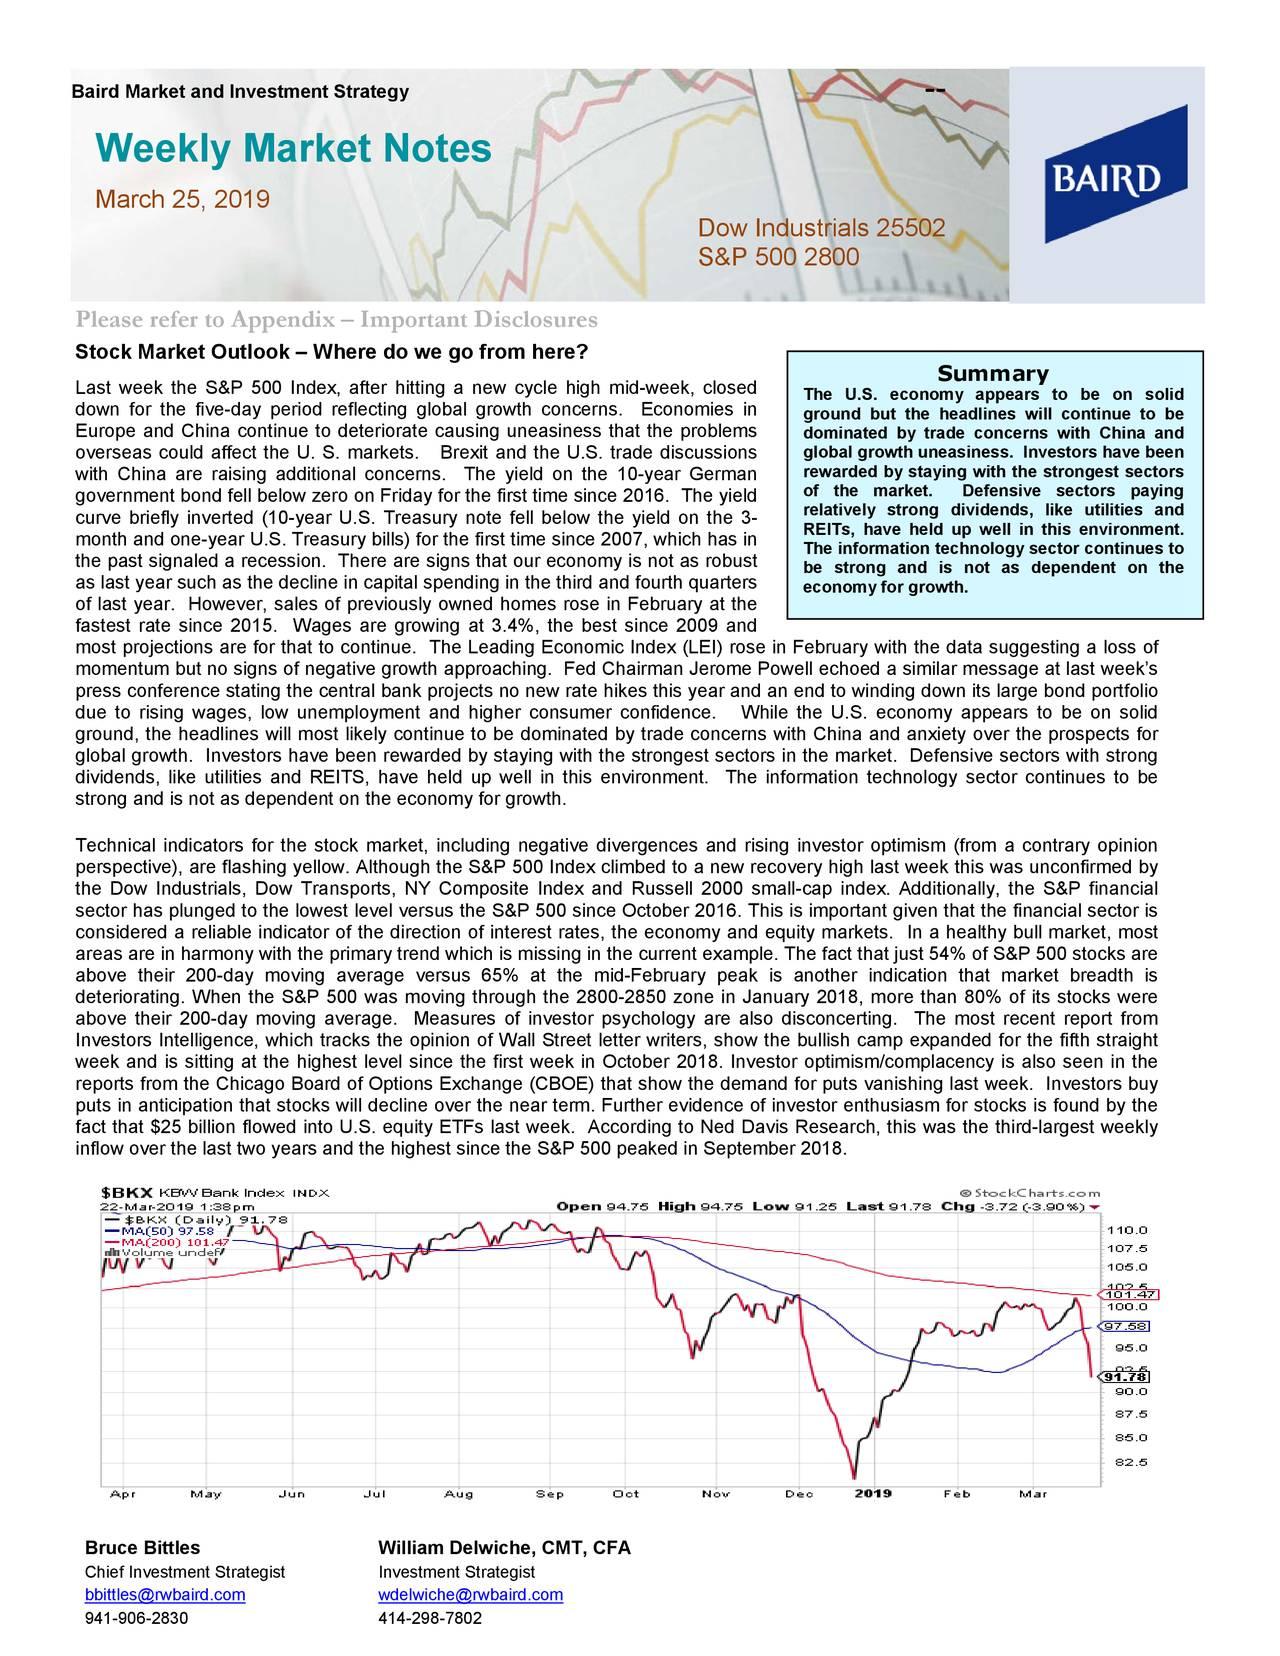 Weekly Market Notes - March 25, 2019 | Seeking Alpha